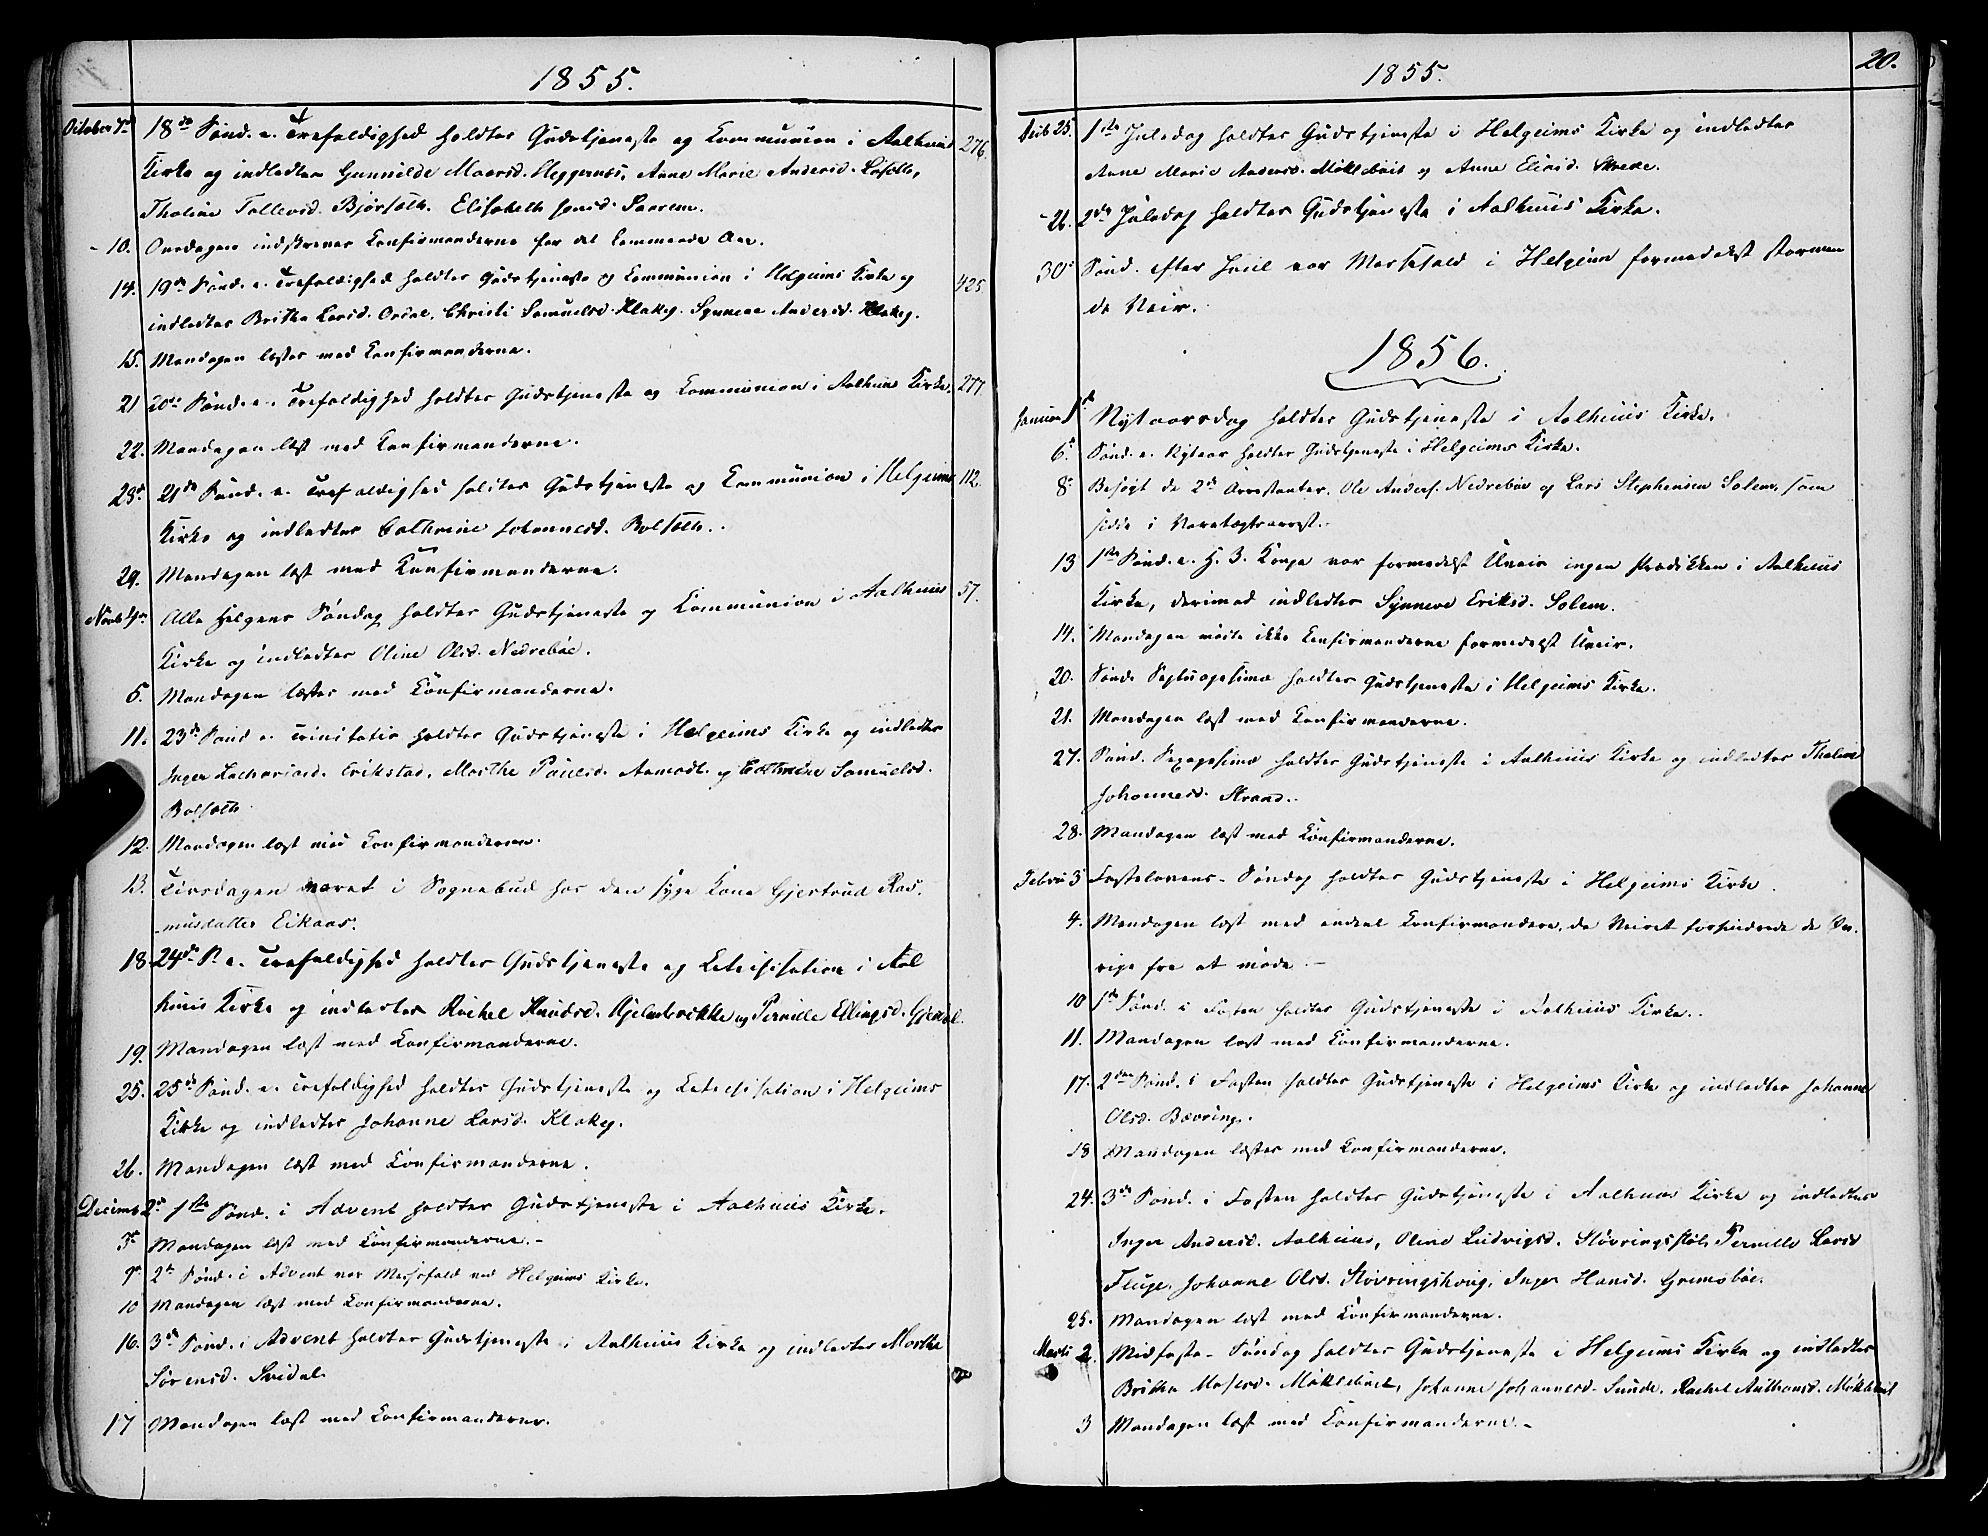 SAB, Jølster sokneprestembete, H/Haa/Haaa/L0010: Parish register (official) no. A 10, 1847-1865, p. 20